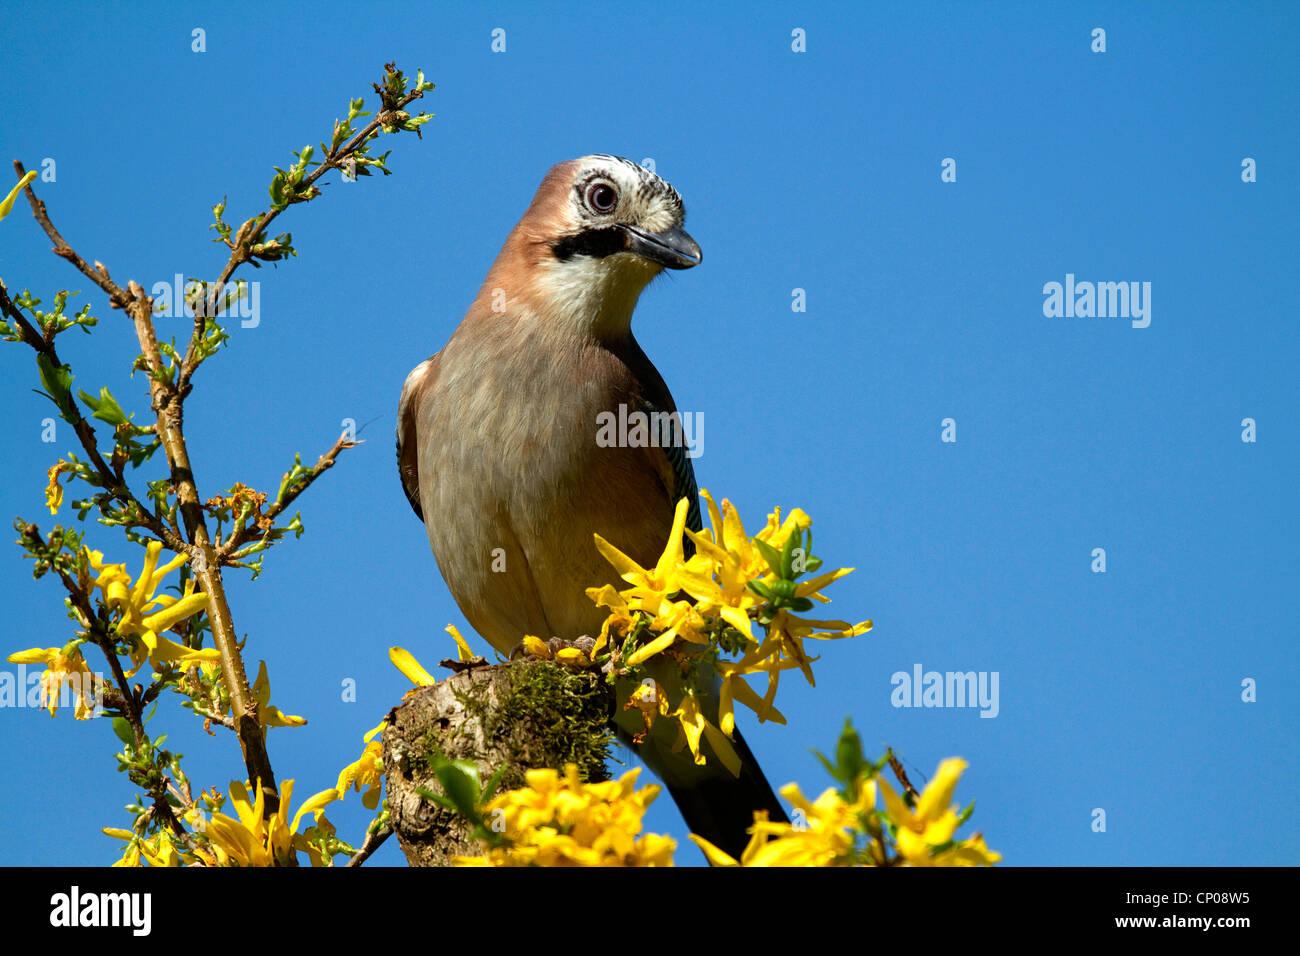 jay (Garrulus glandarius), sitting on a branch of Forsythia, Germany Stock Photo